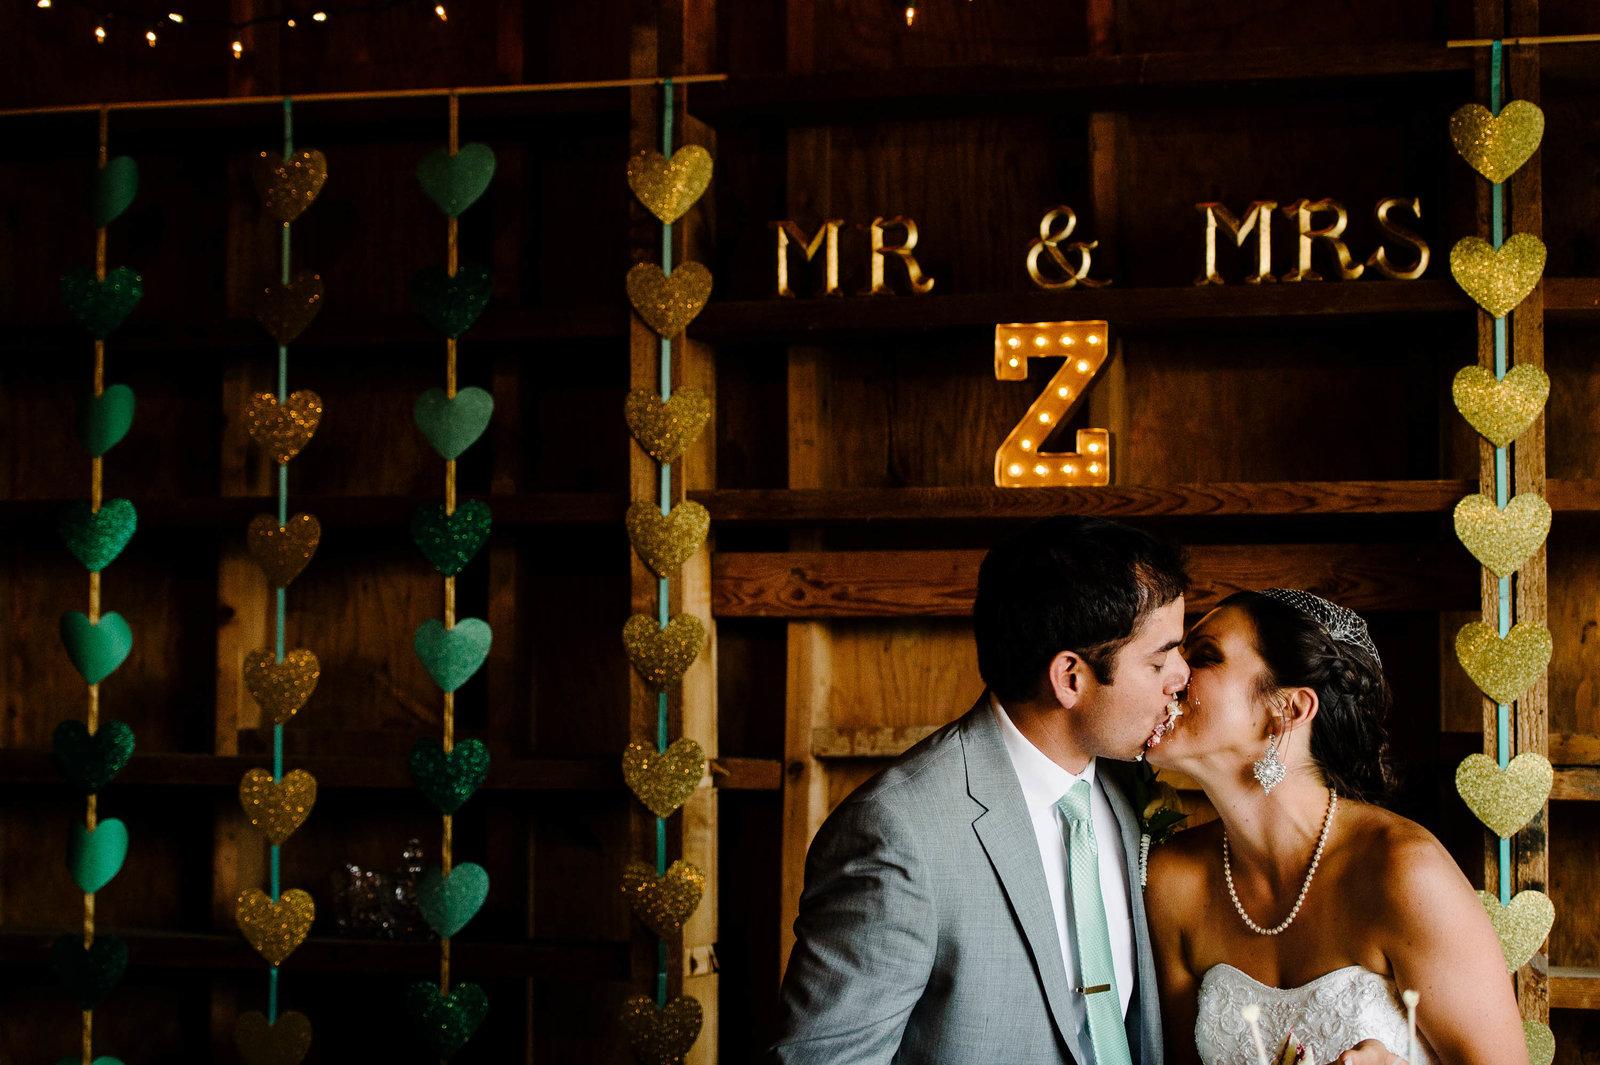 194-El-paso-wedding-photographer-KaCh_0669